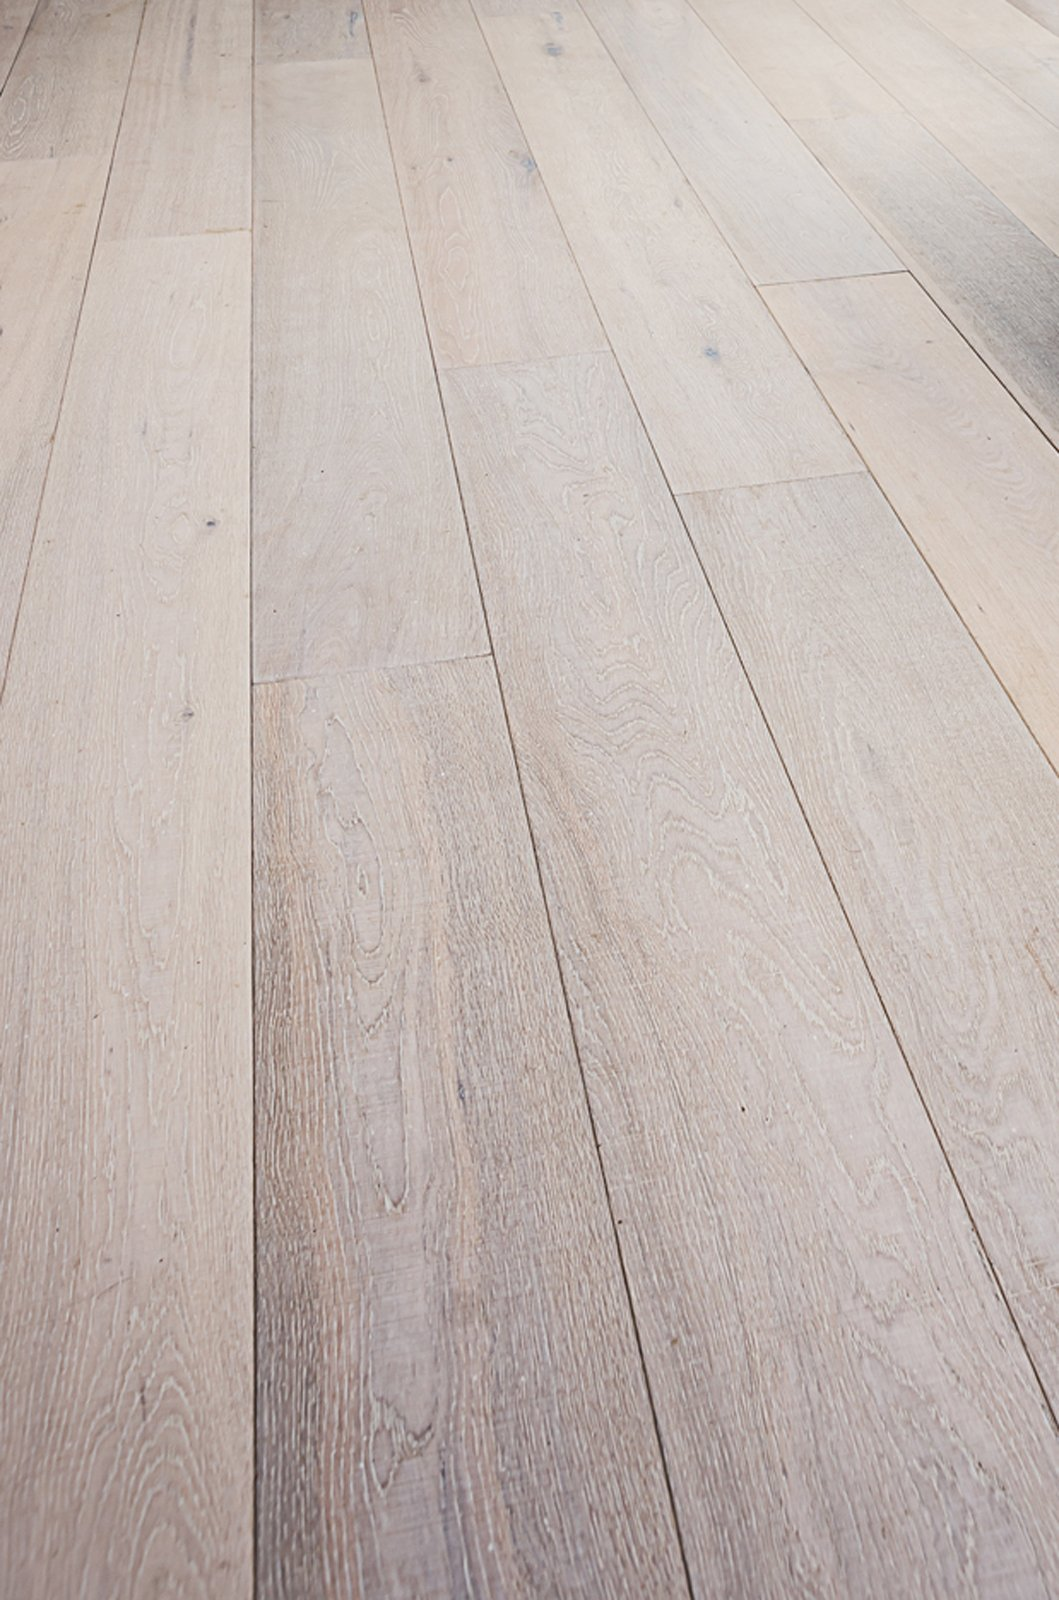 Ikea pavimento in legno awesome parquet flottante u for Pavimenti linoleum ikea